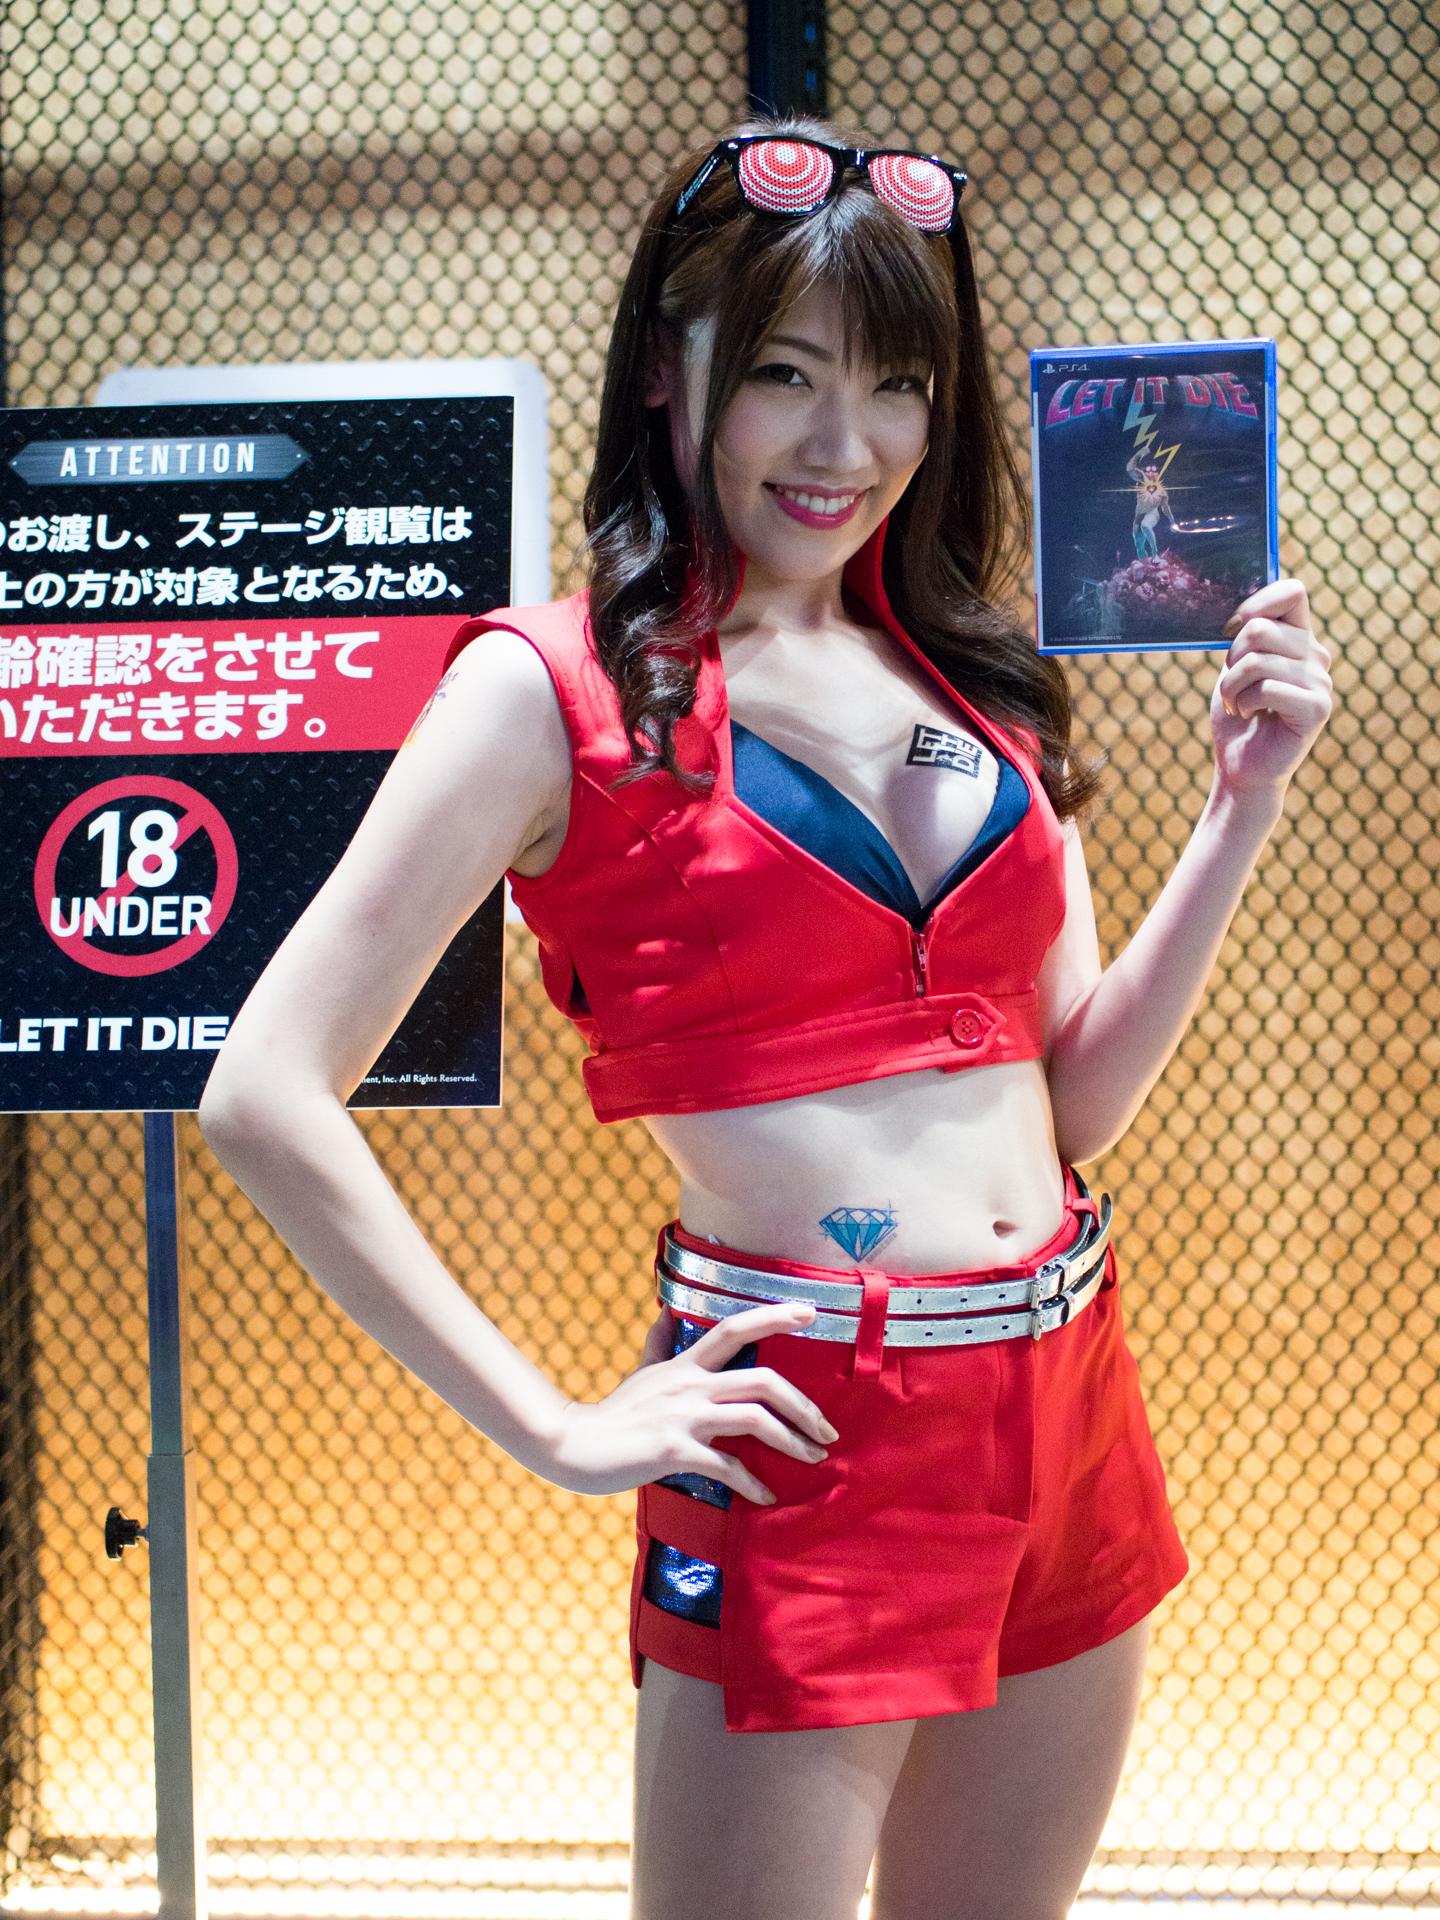 LET IT DIE 東京ゲームショウ2017